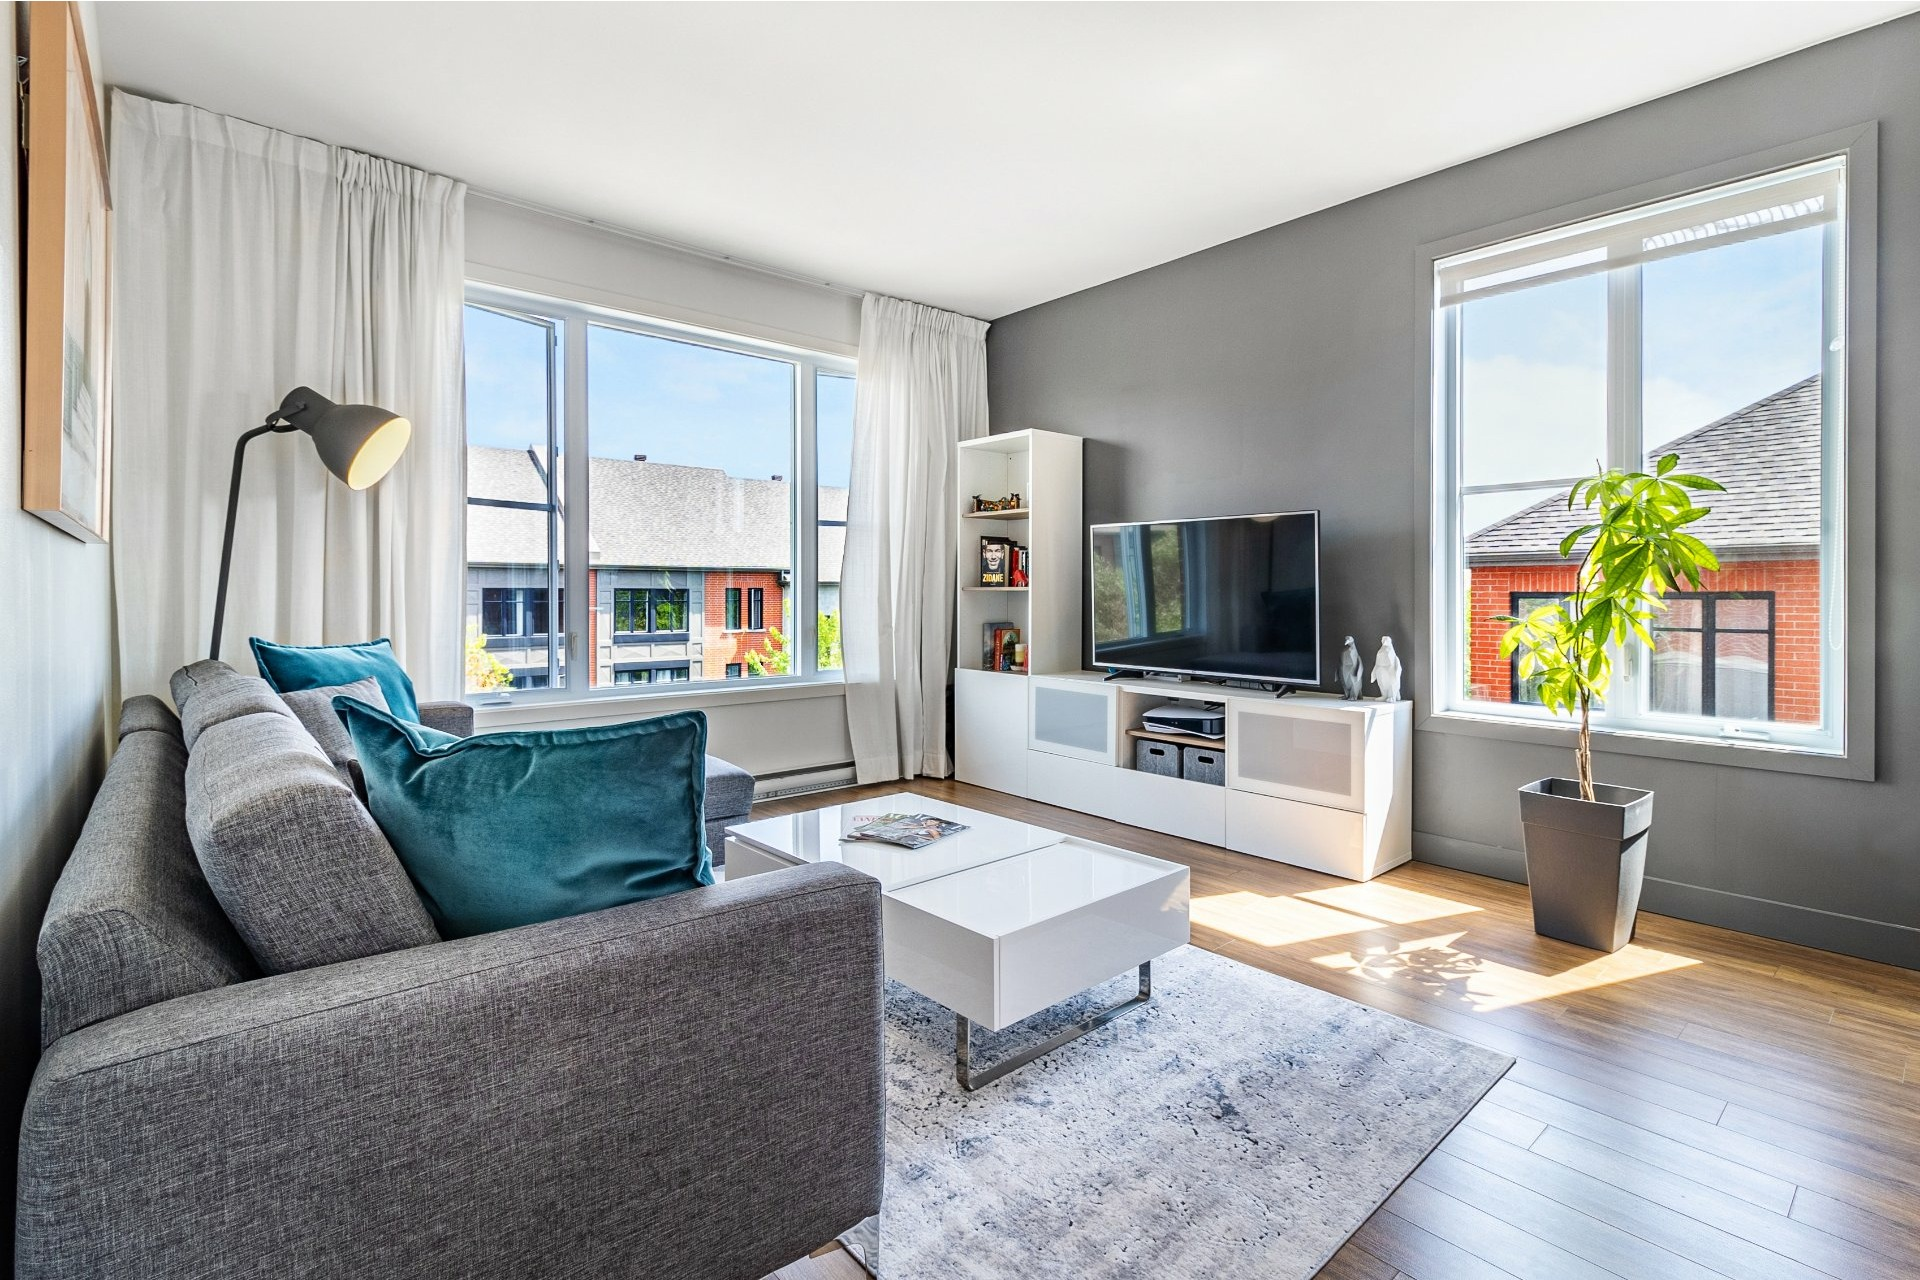 image 6 - Apartment For sale Saint-Hubert Longueuil  - 7 rooms